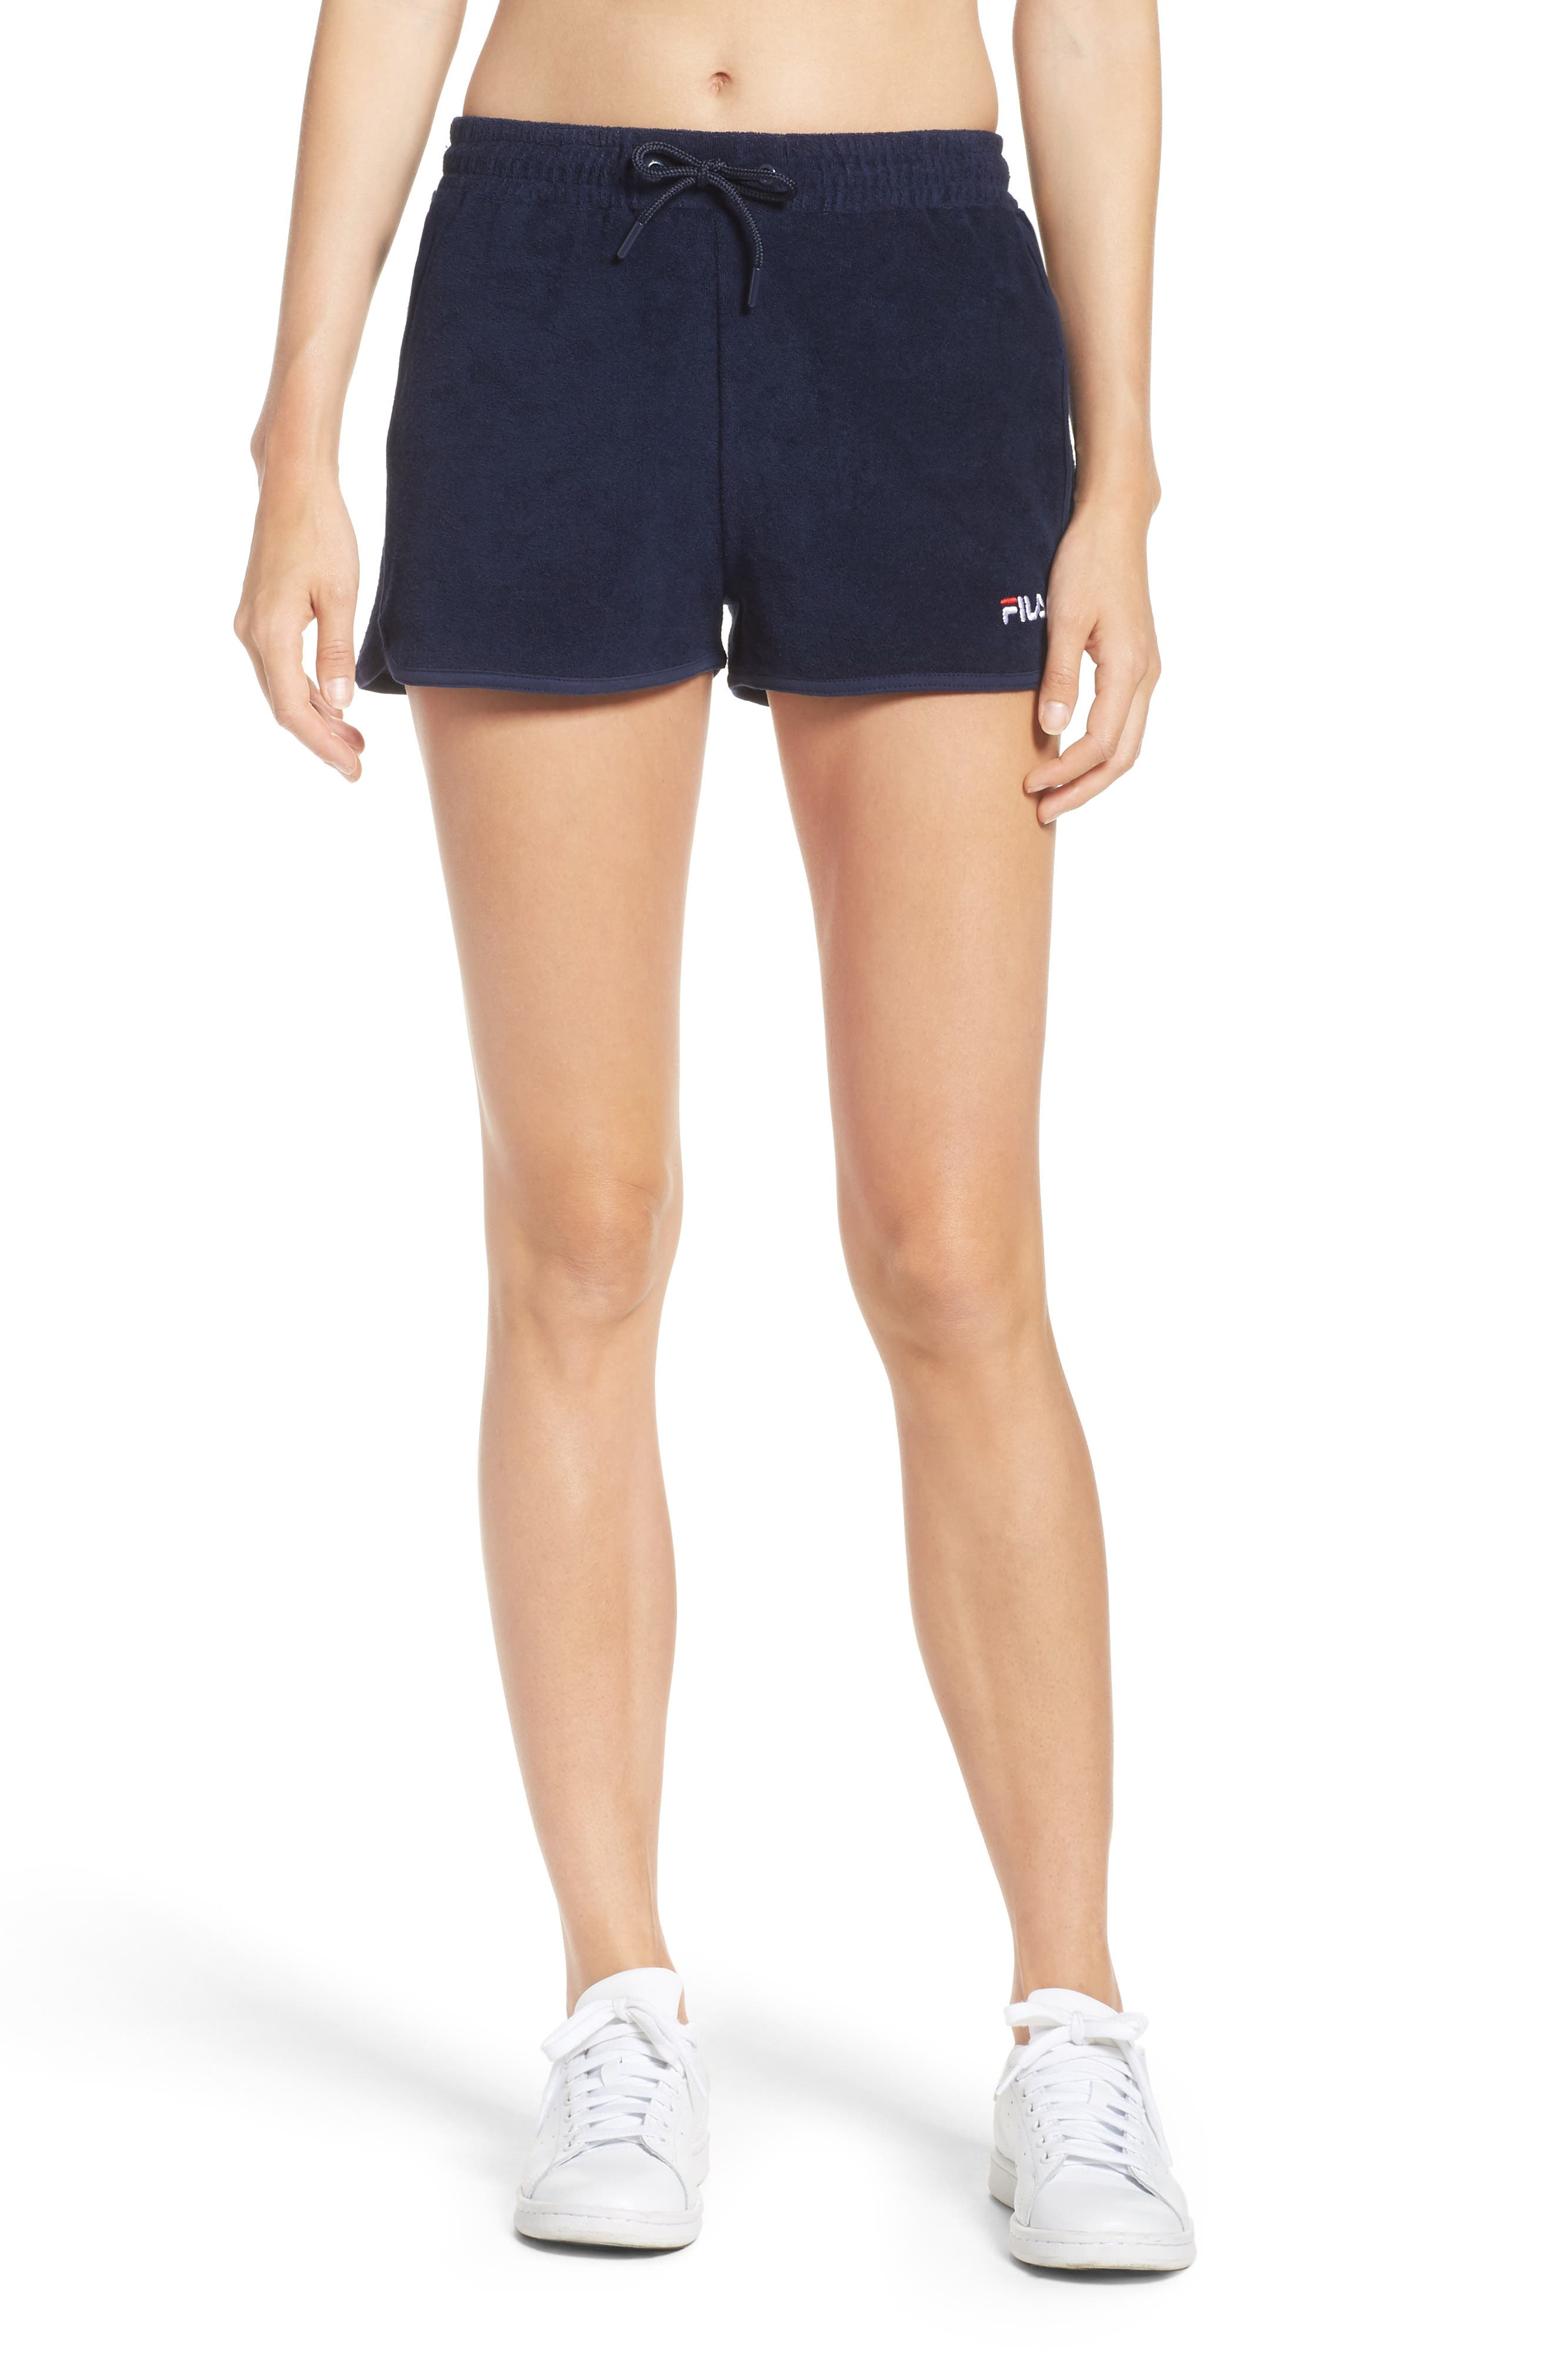 Follie Shorts,                         Main,                         color, Peacoat